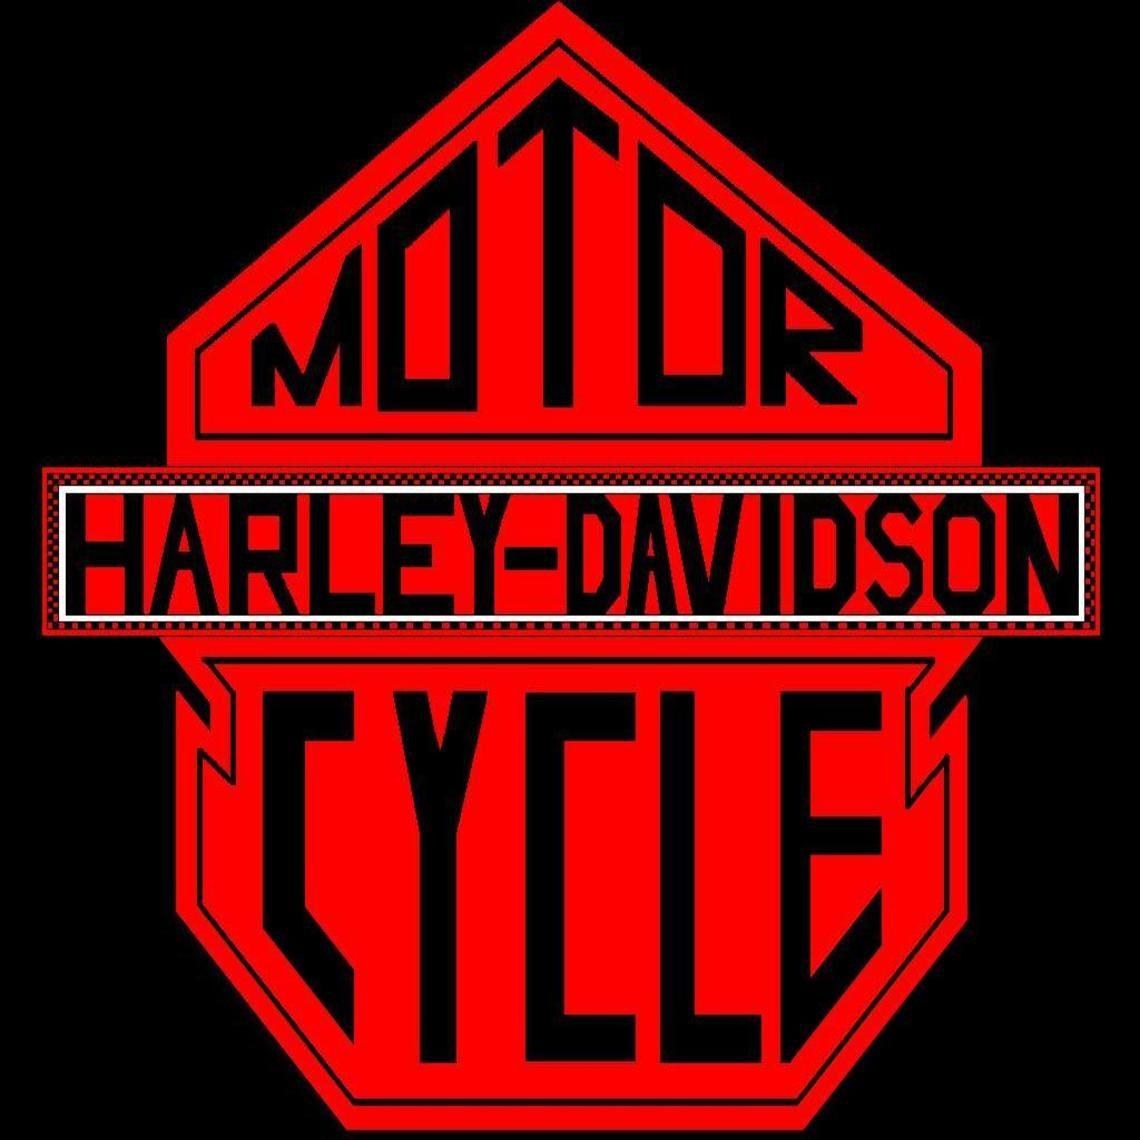 Harley Davidson Bar Shield Logo Rund Ums Haus